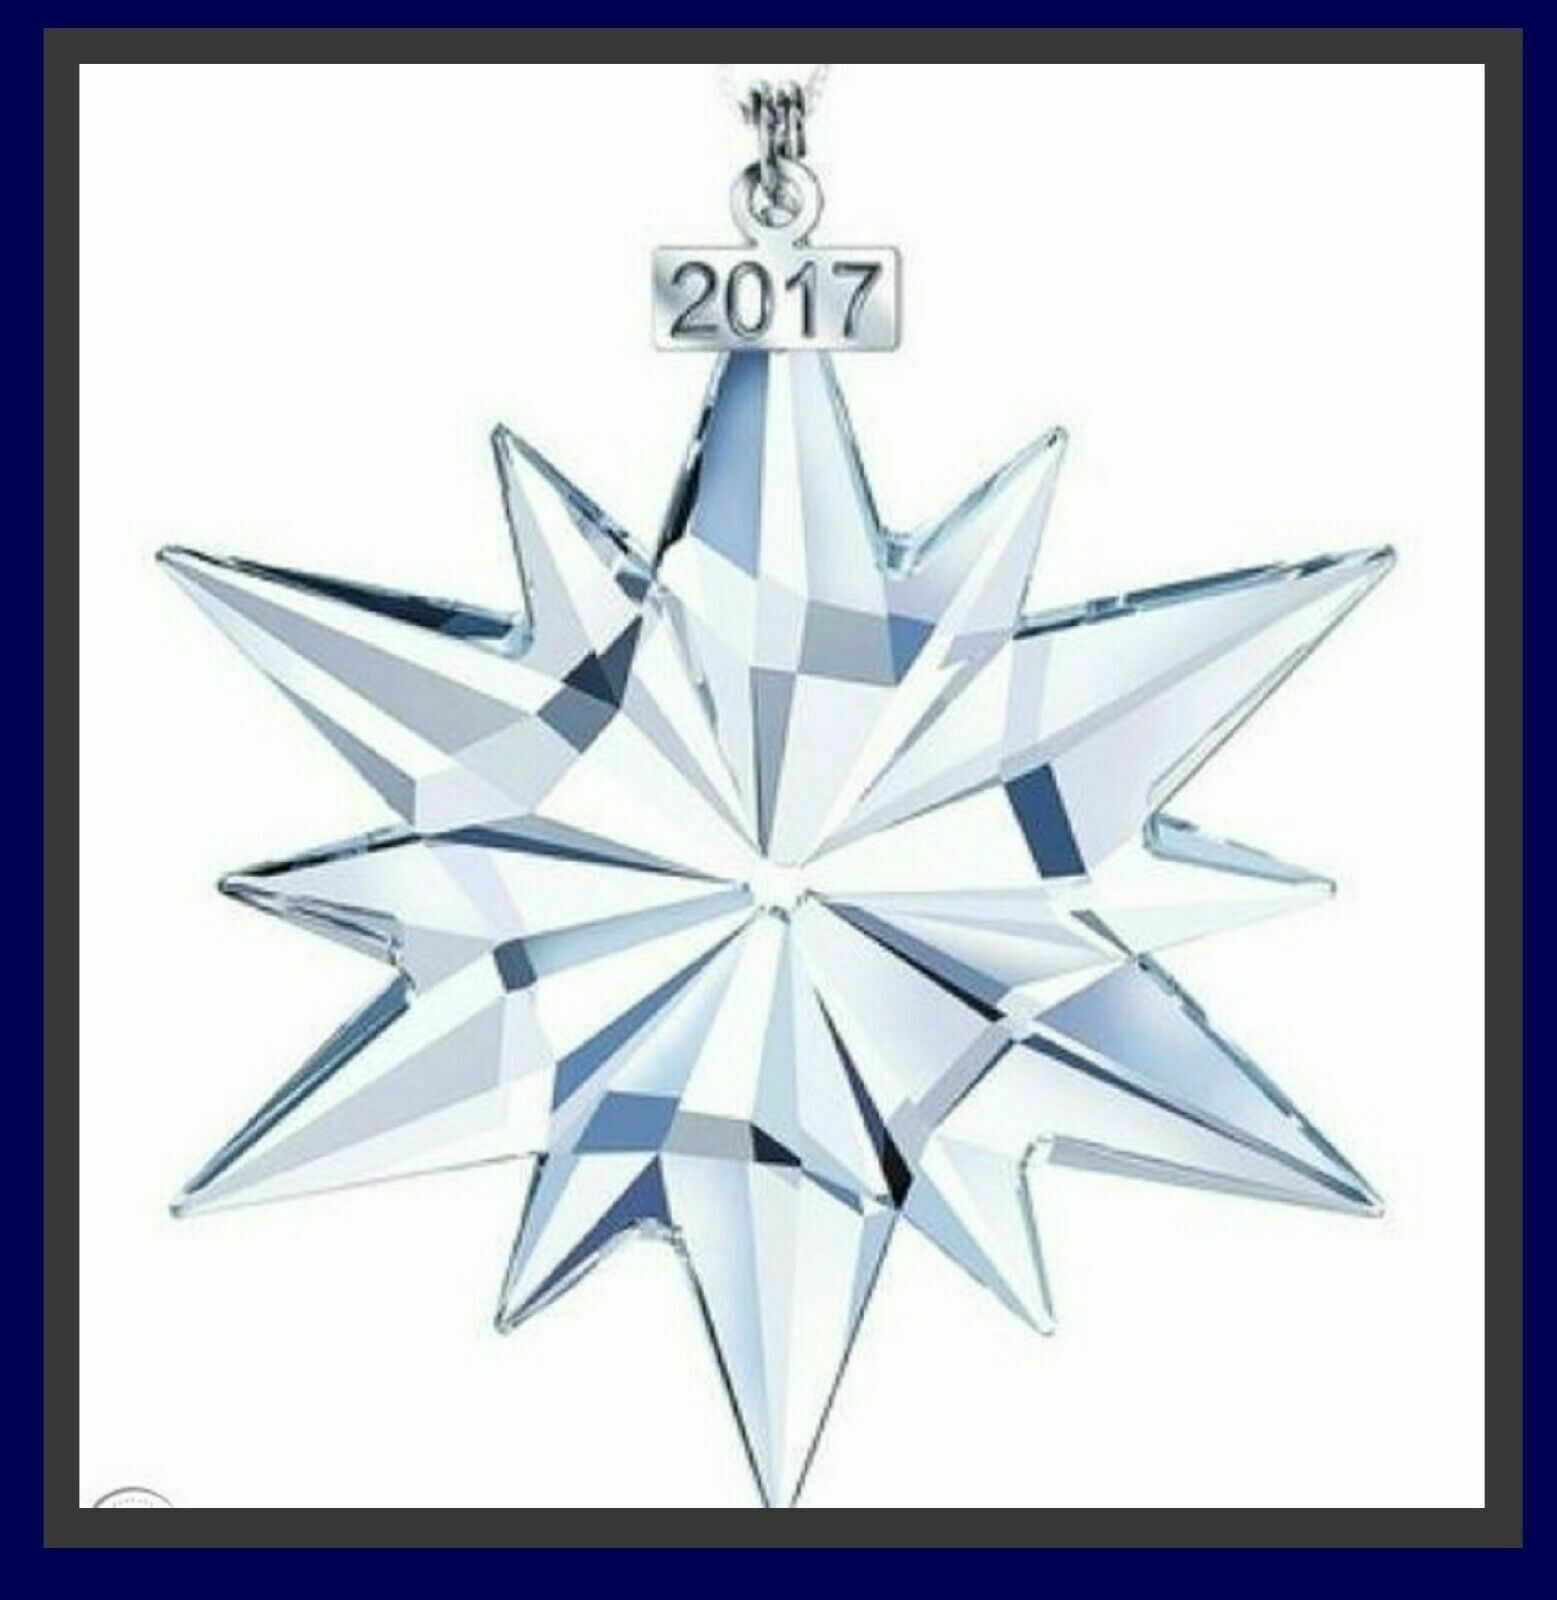 NEW Swarovski Clear Crystal Christmas Ornament 2017 Christmas Snowflake